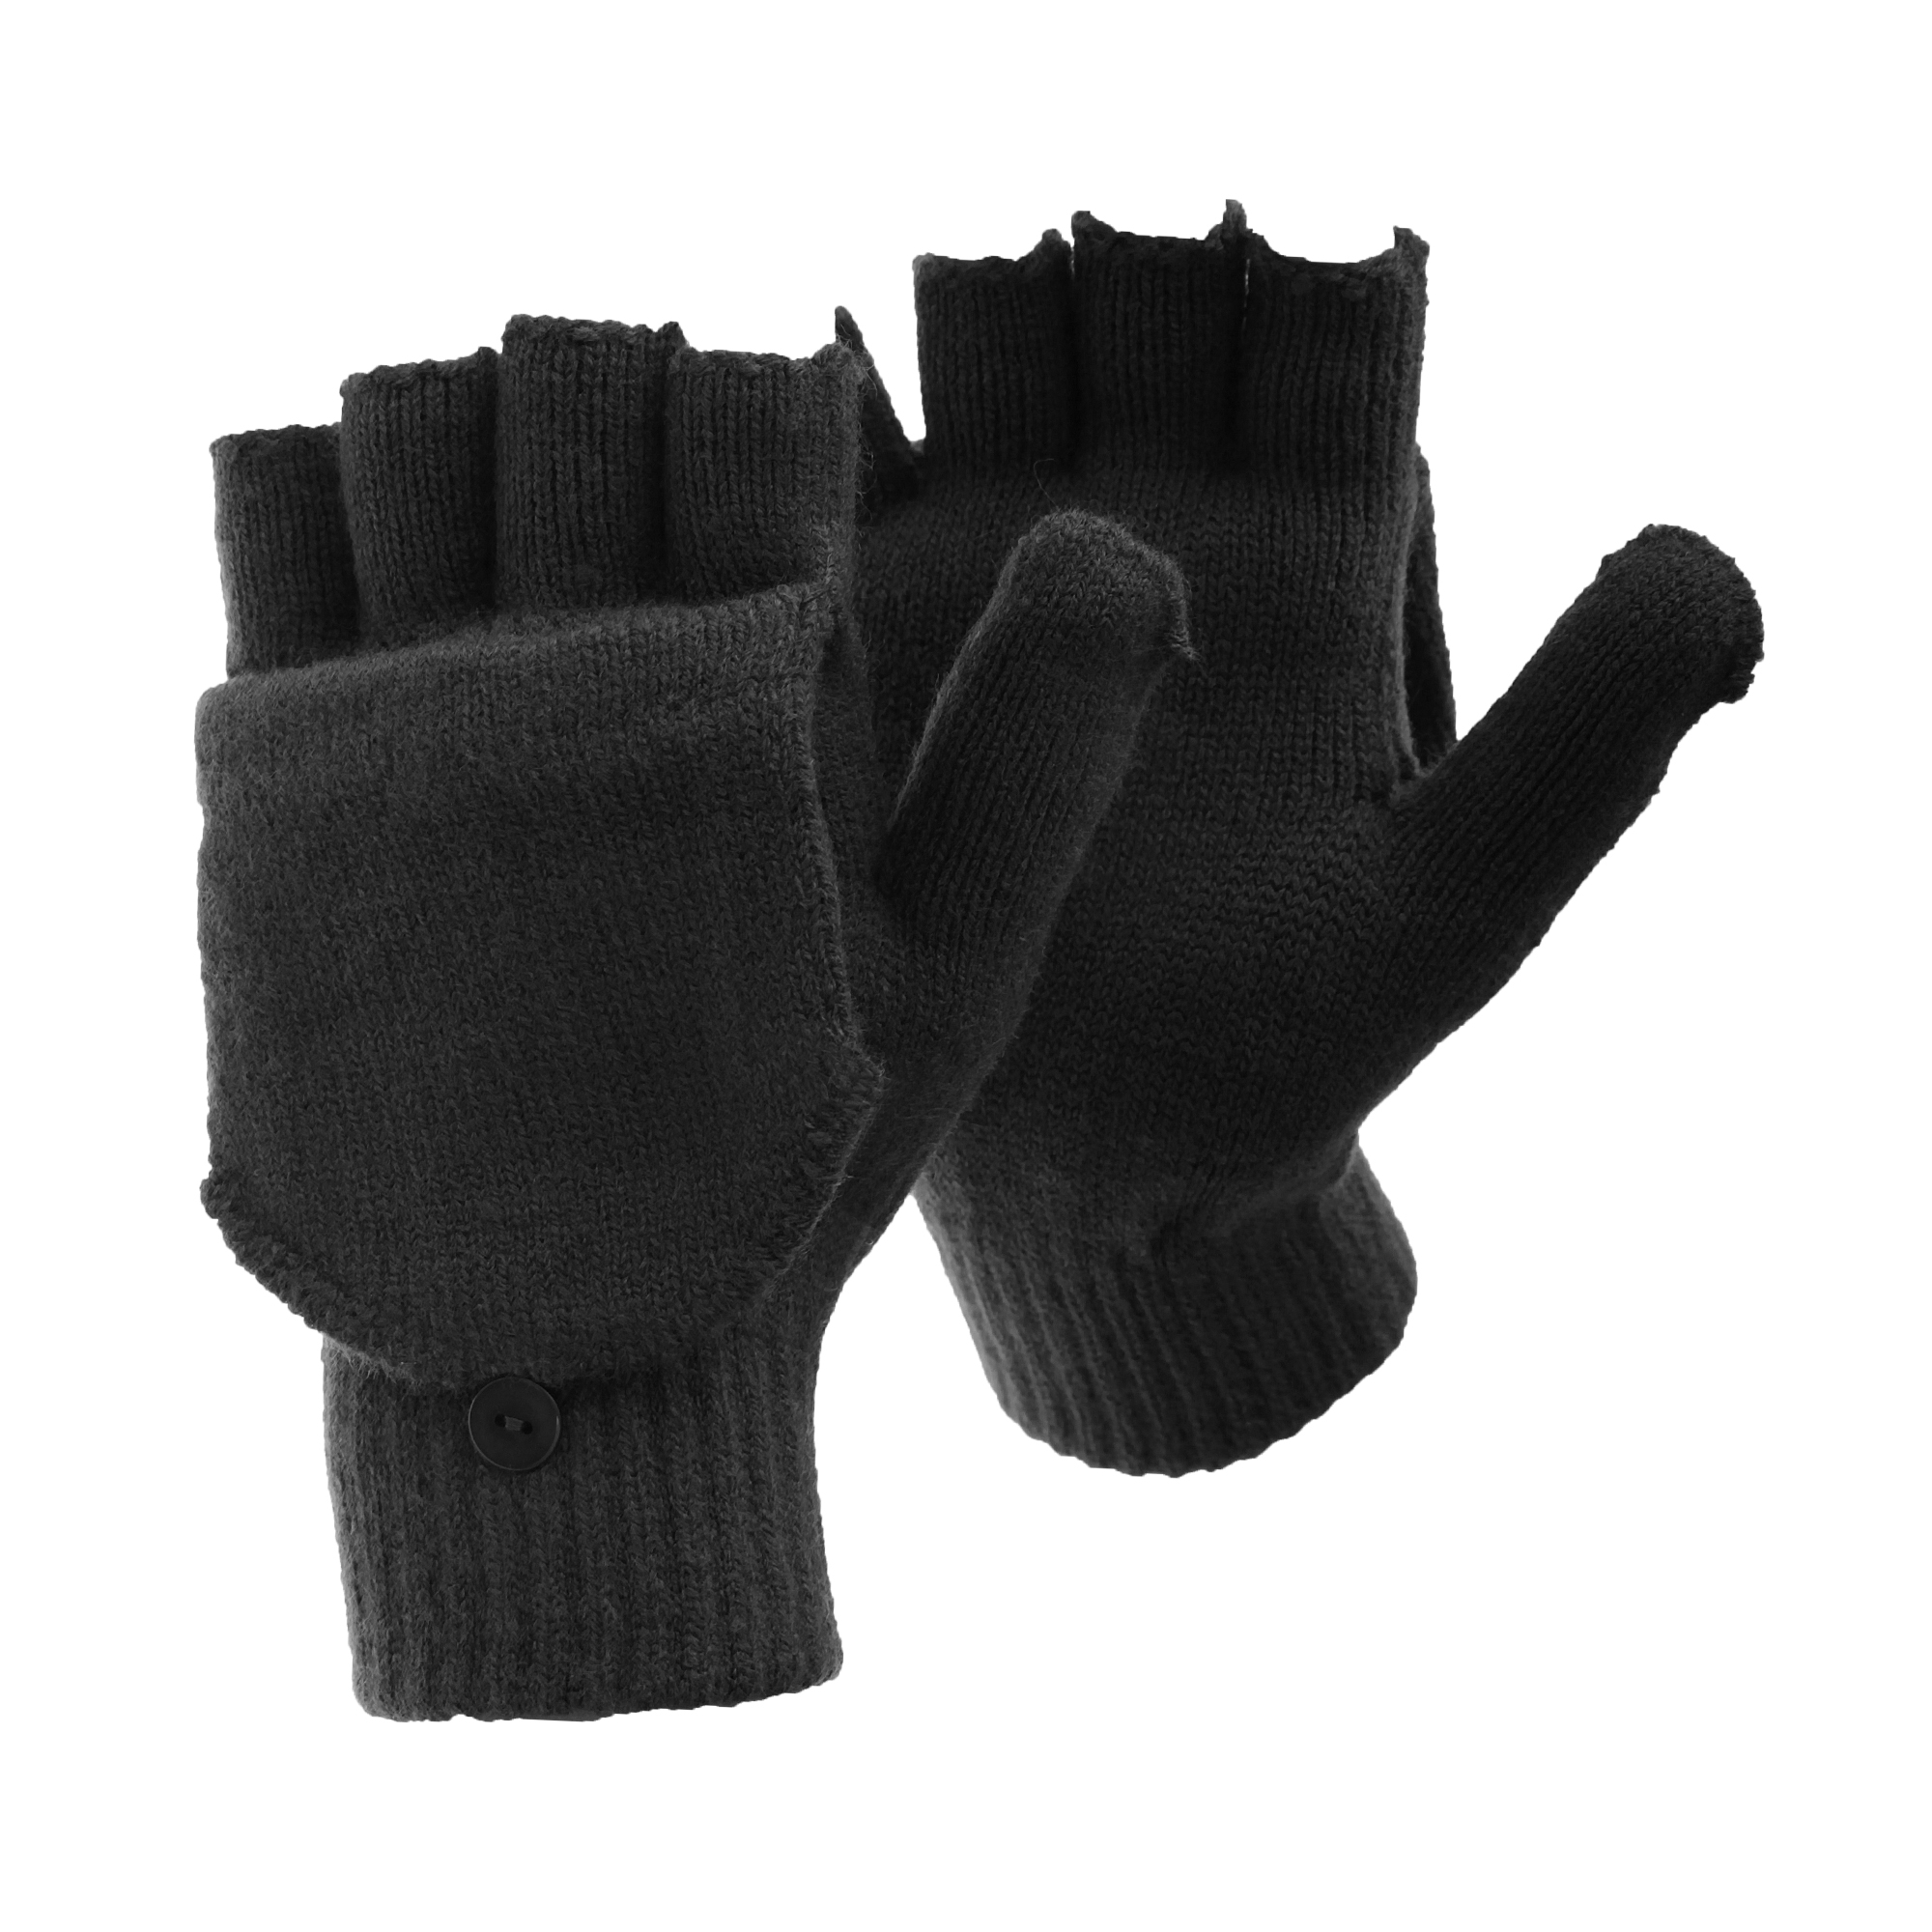 Fingerless driving gloves ebay -  Picture 4 Of 5